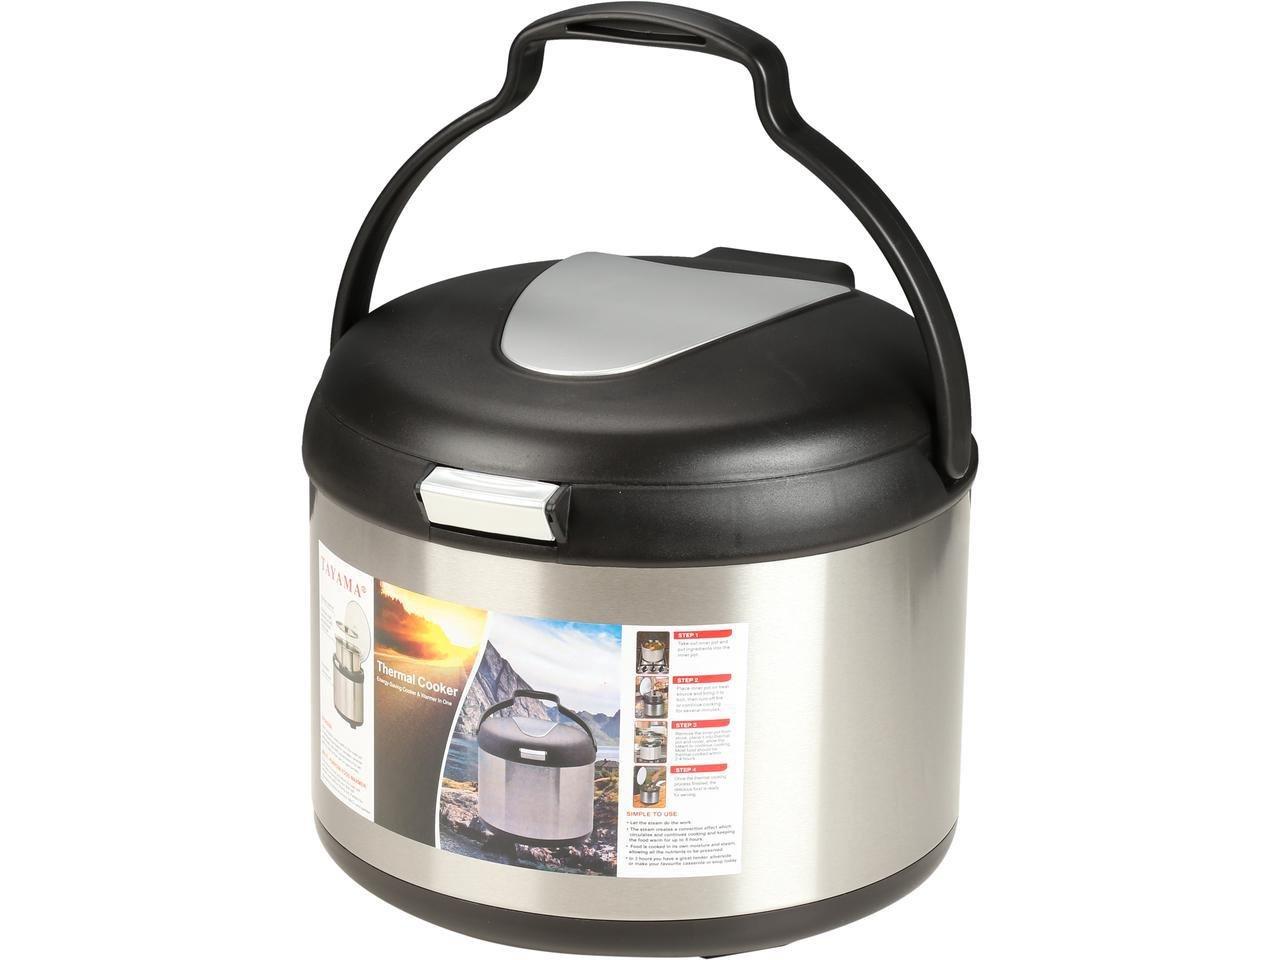 Tayama TXM-50CF Energy-Saving Thermal Cooker, 5 L, Black by TAYAMA (Image #2)